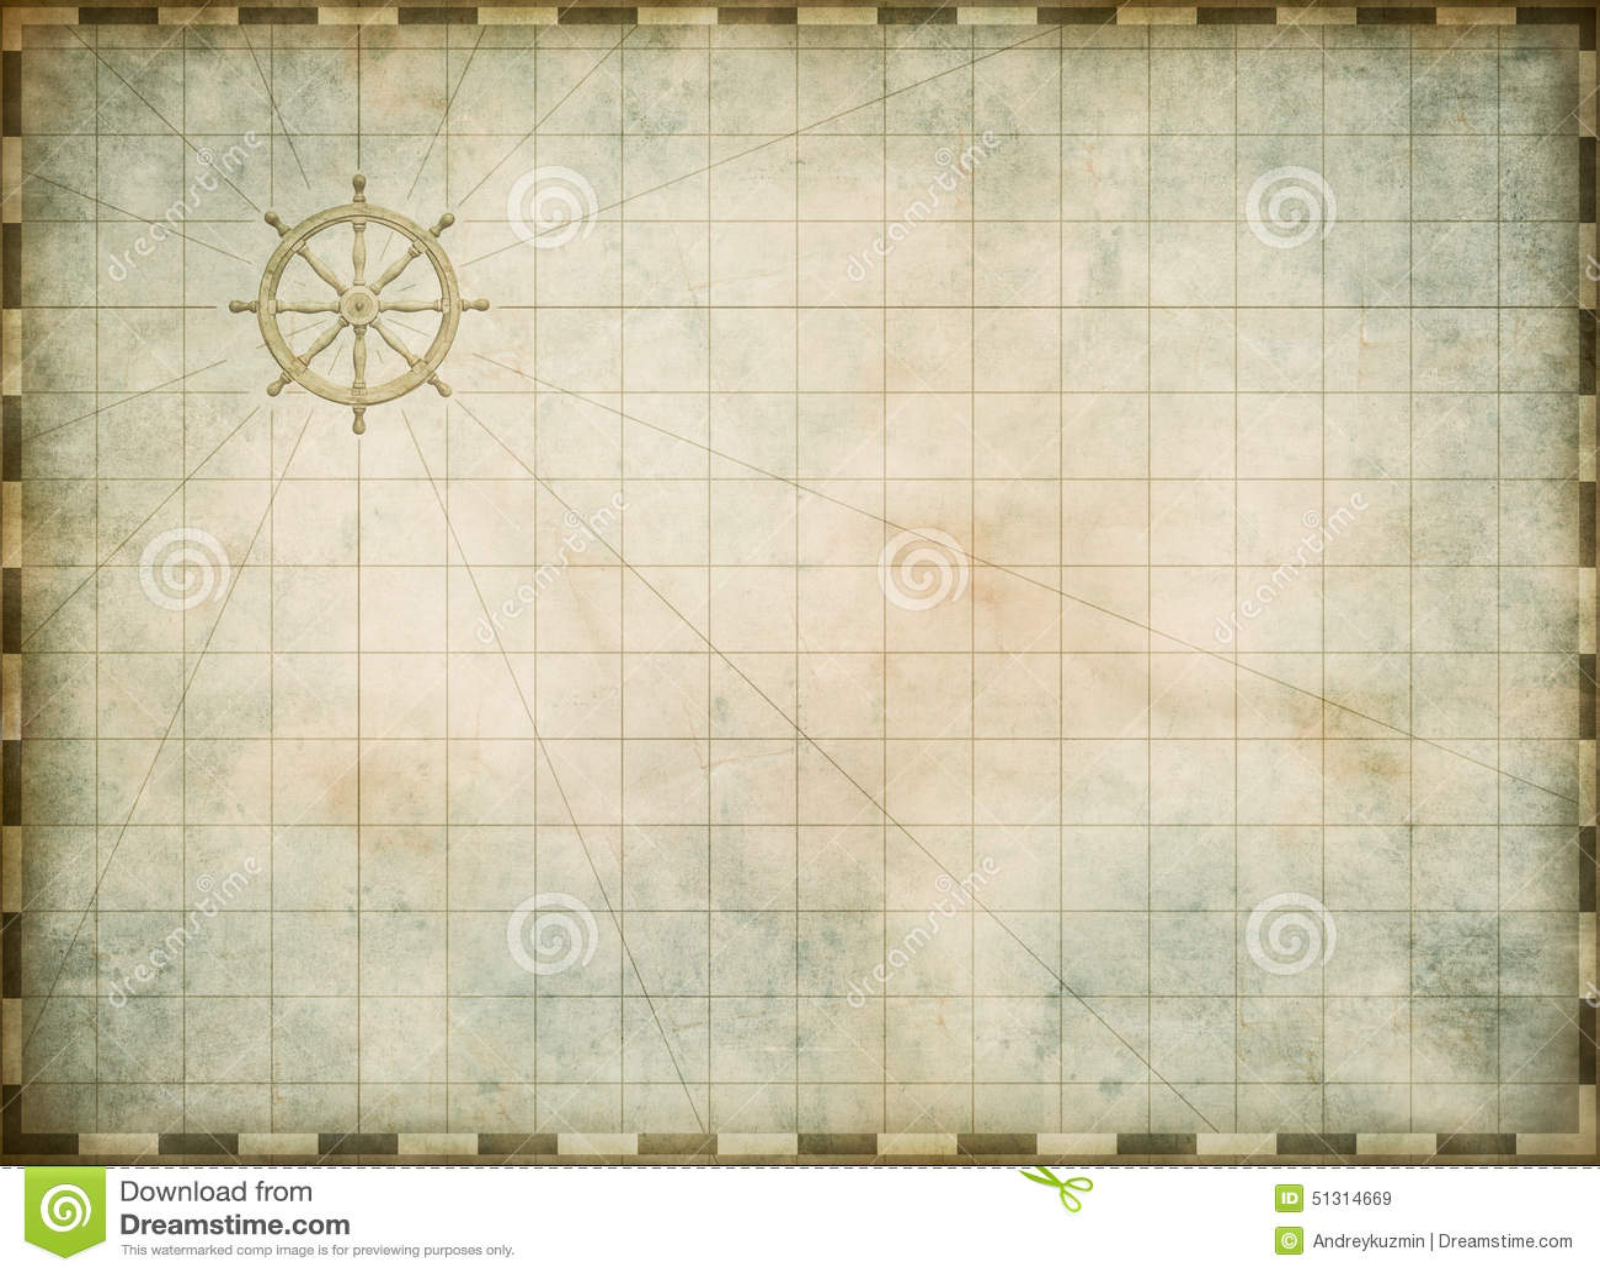 Vintage Nautical Map 26